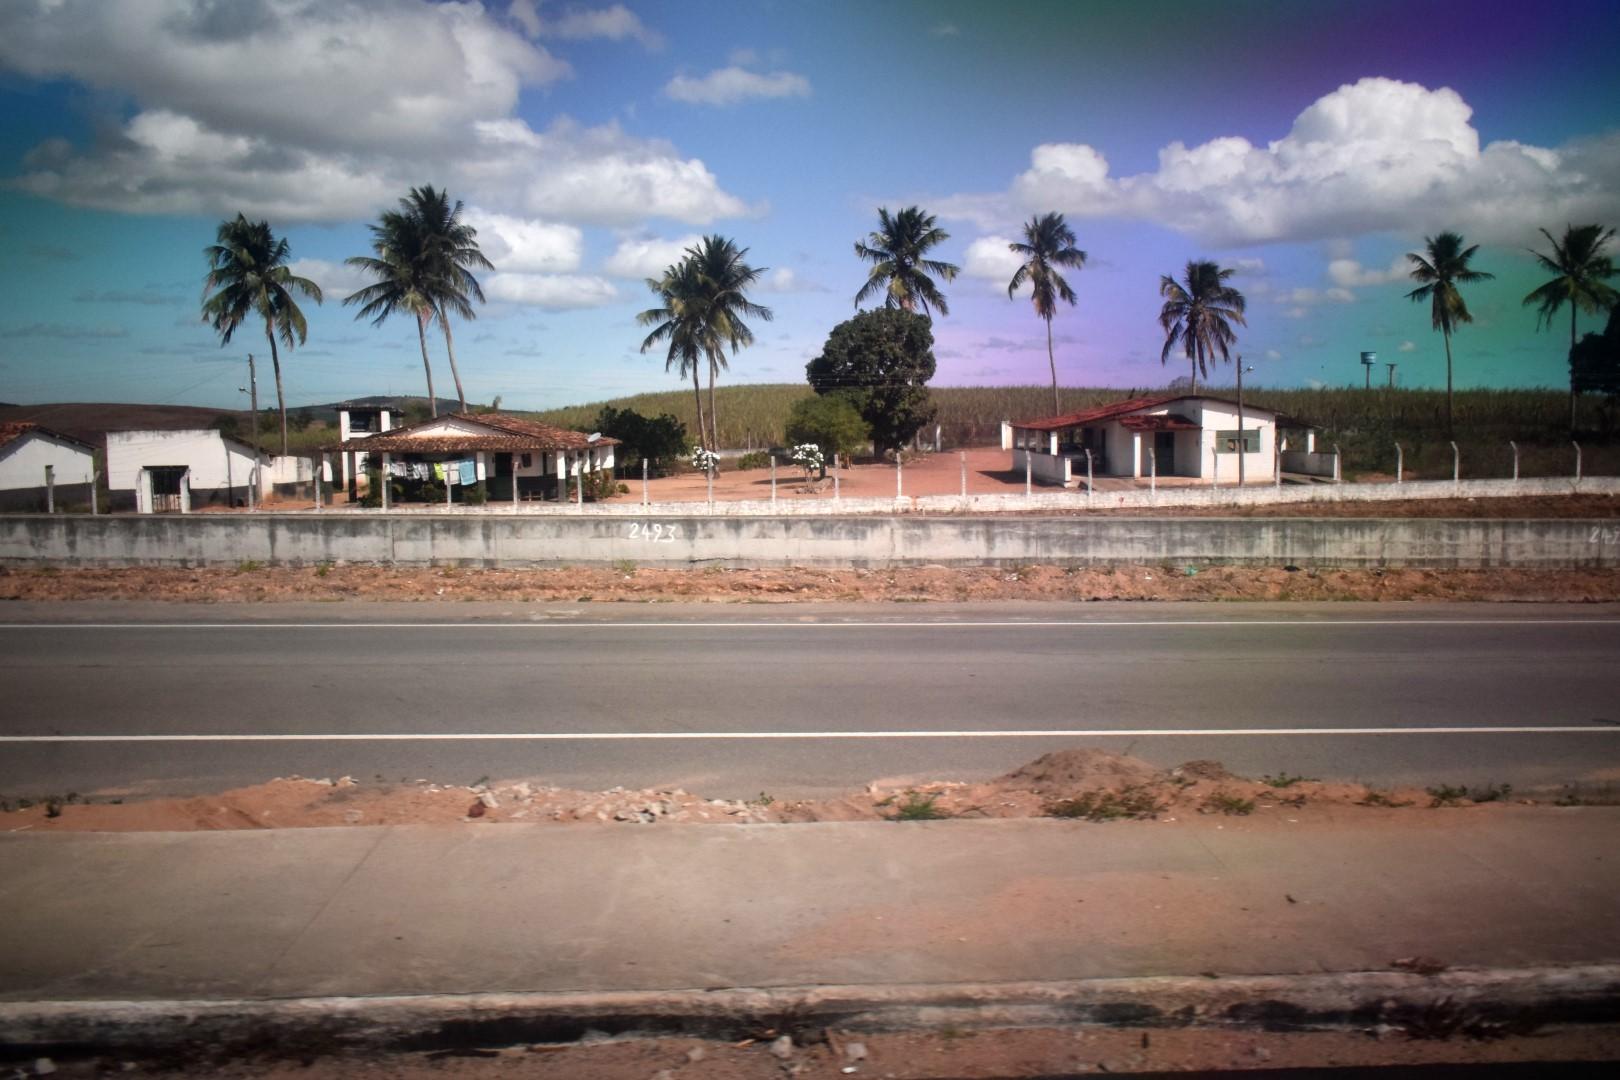 Maceió to Aracaju